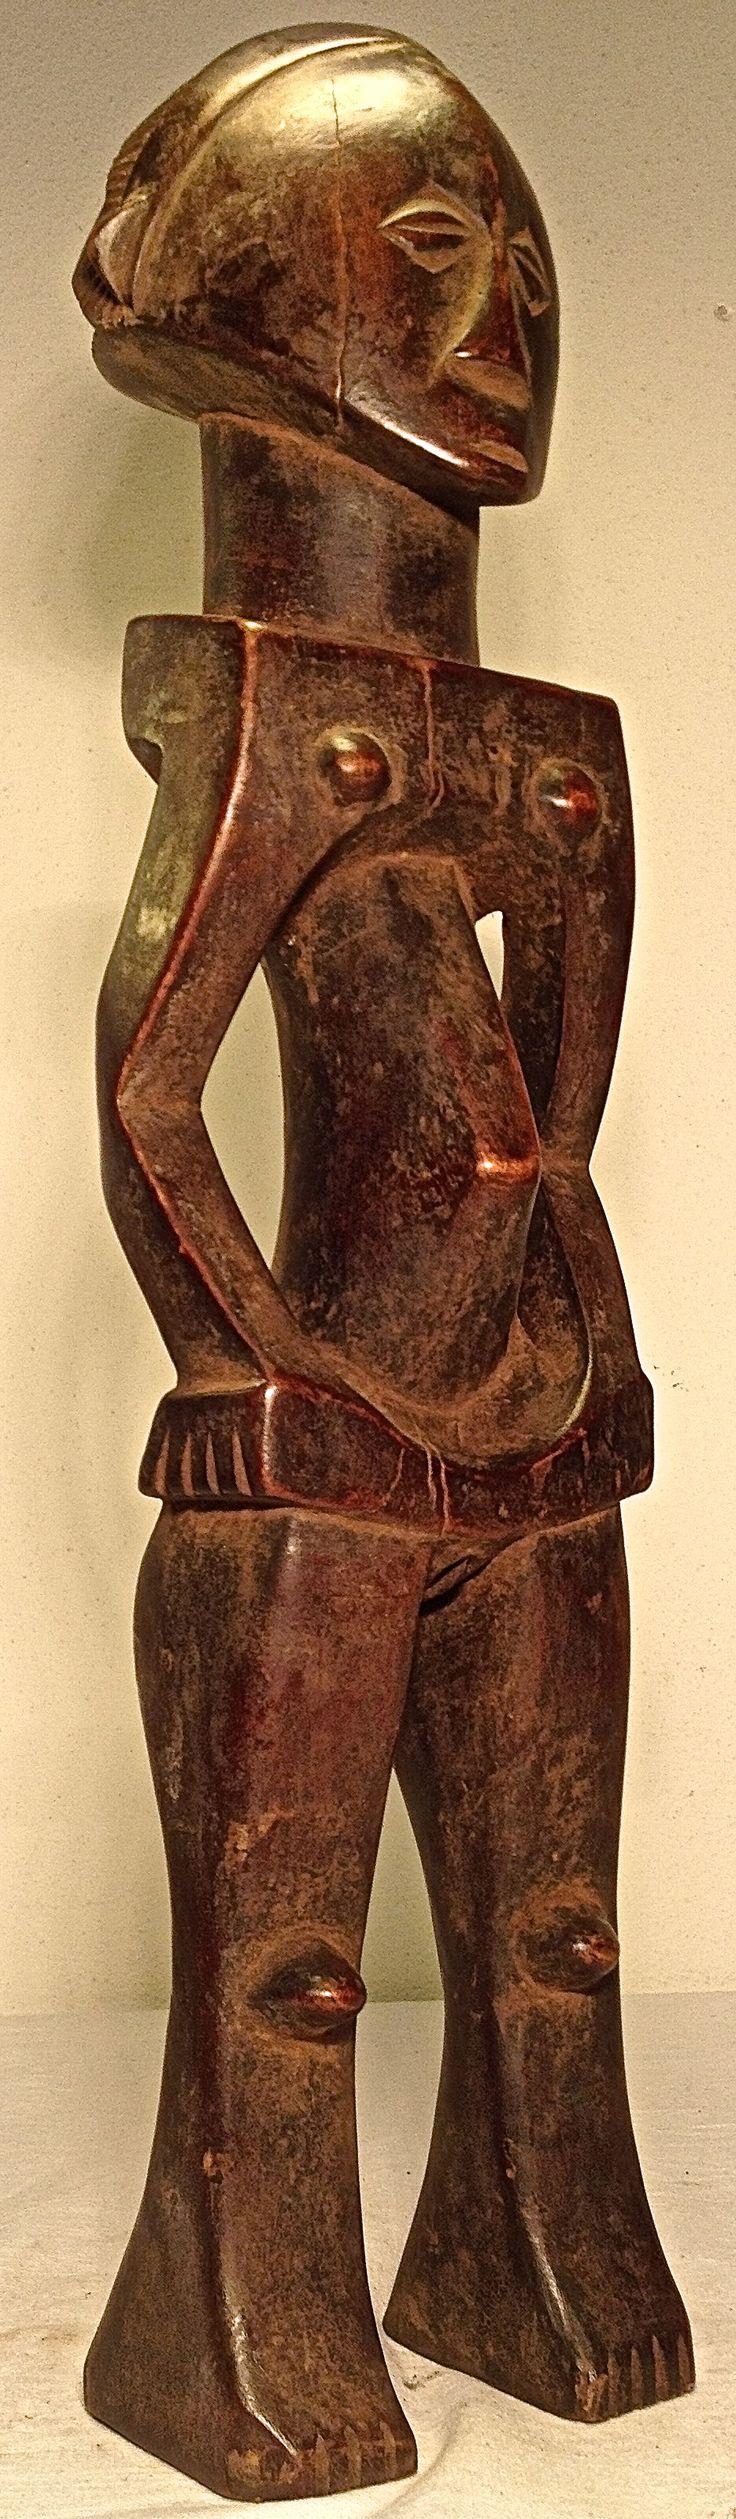 Luba Shankadi female figure